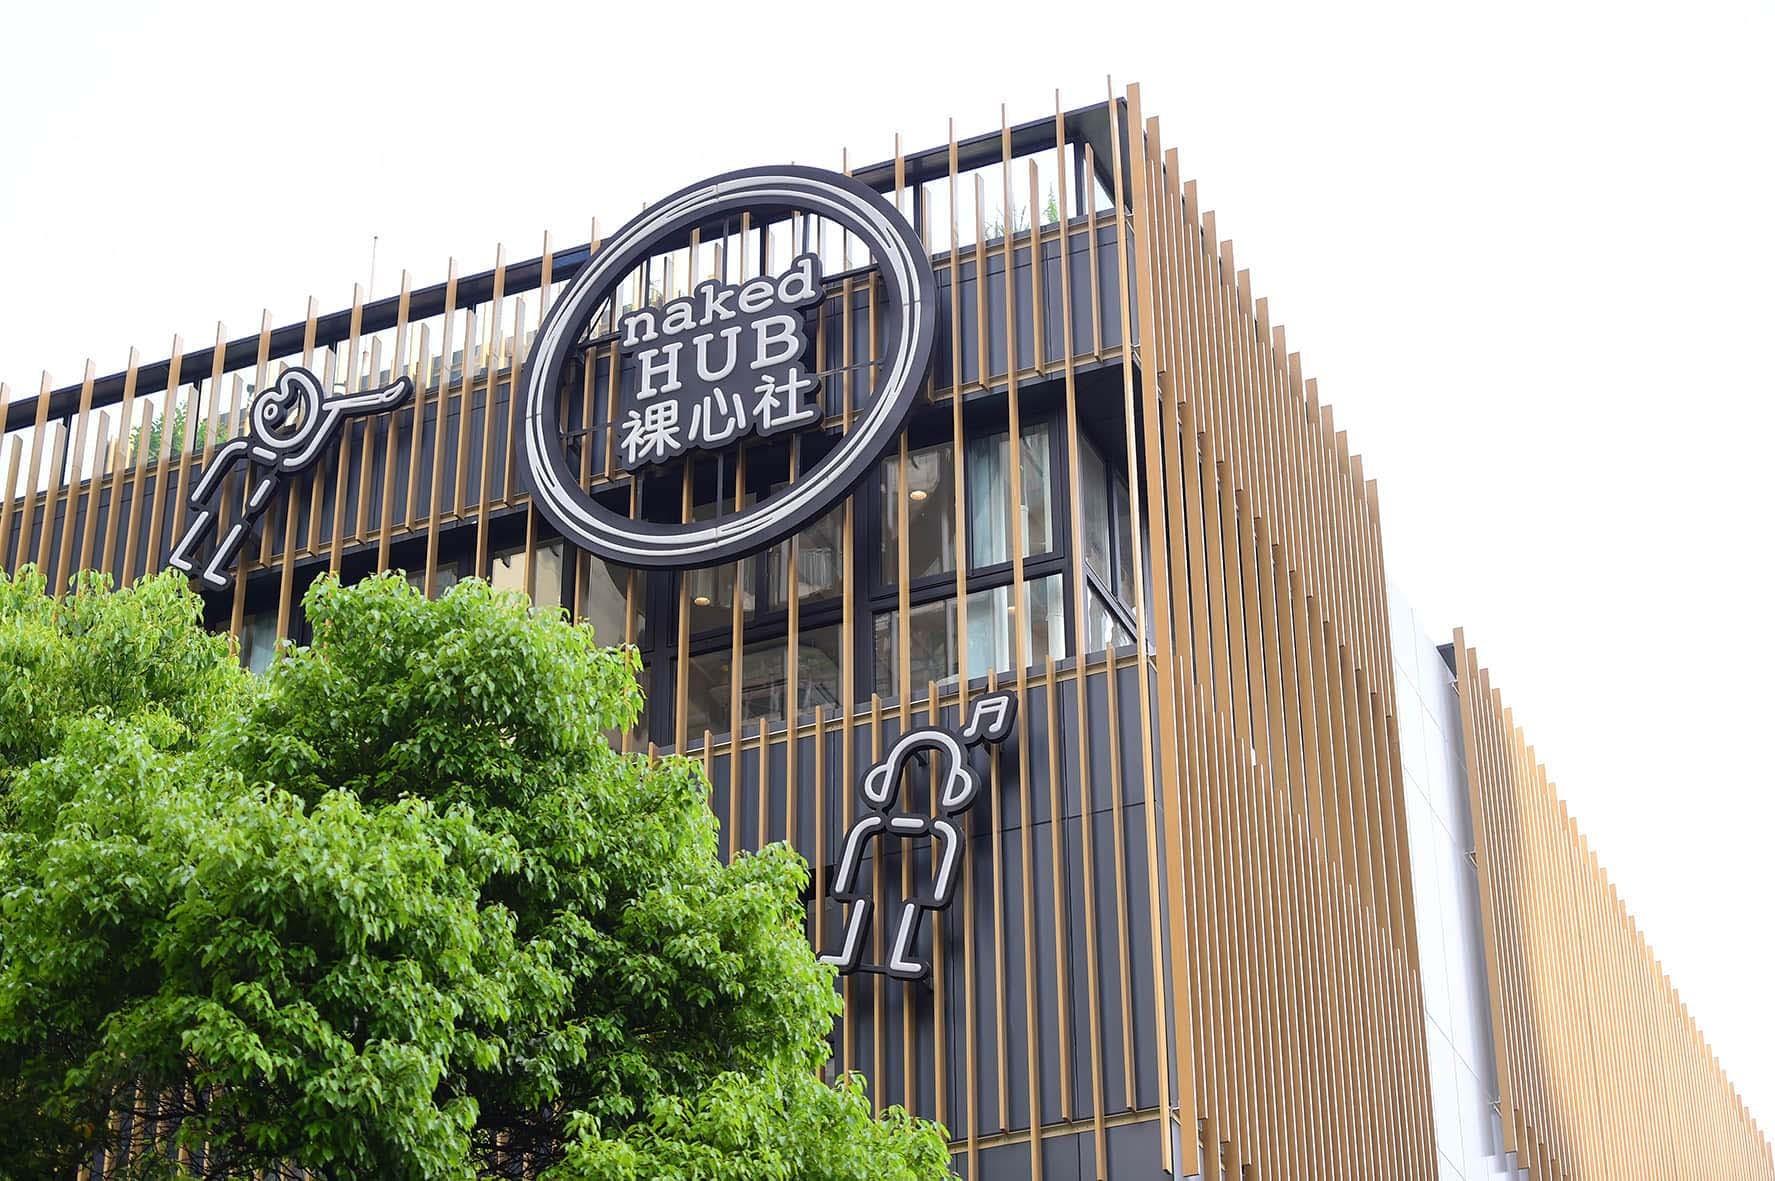 Naked Hub - Nan Jing Lu, Shanghai - Read Reviews Online